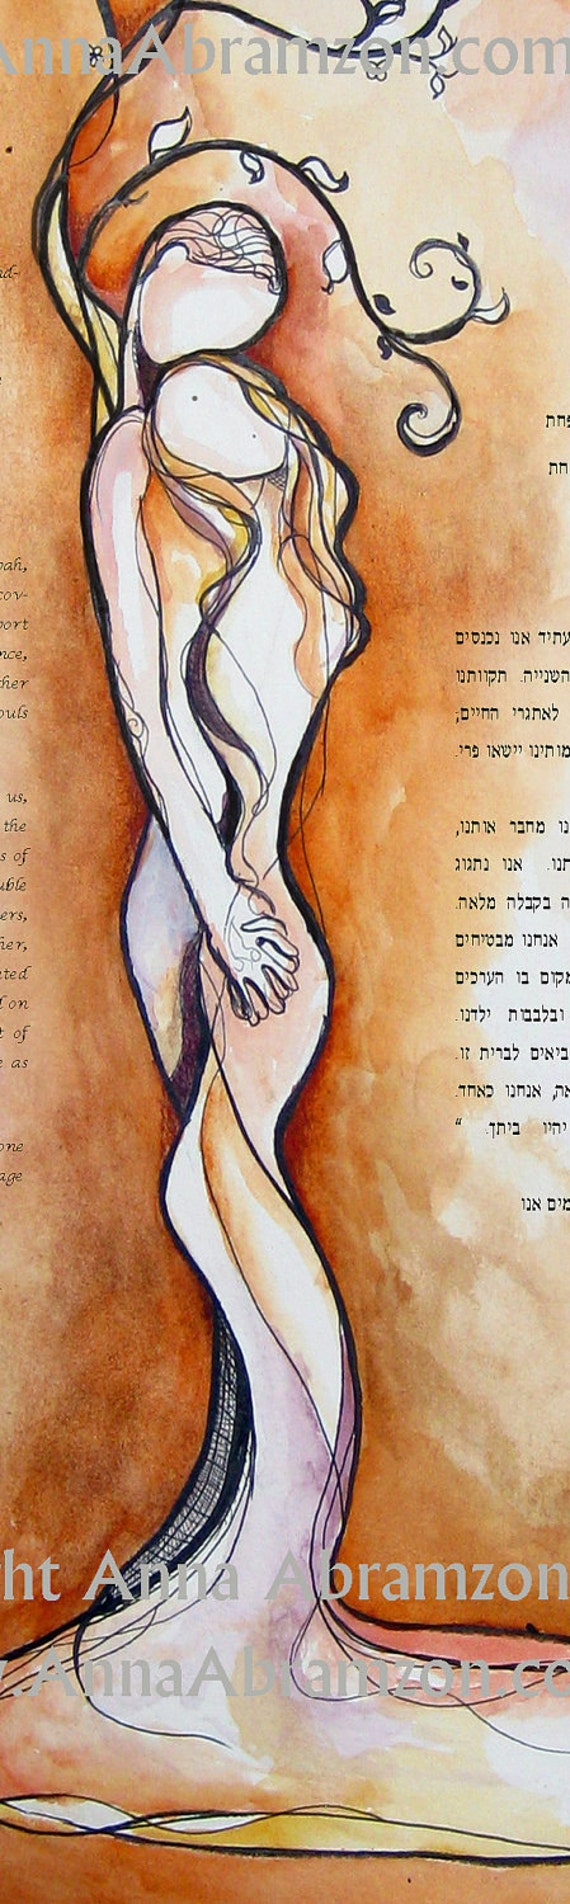 Classic Tree Ketubah modern ketubah, interfaith ketubah watercolor ketubah Jewish wedding Jewish ketubah katuba katubahs ketuba Conservative